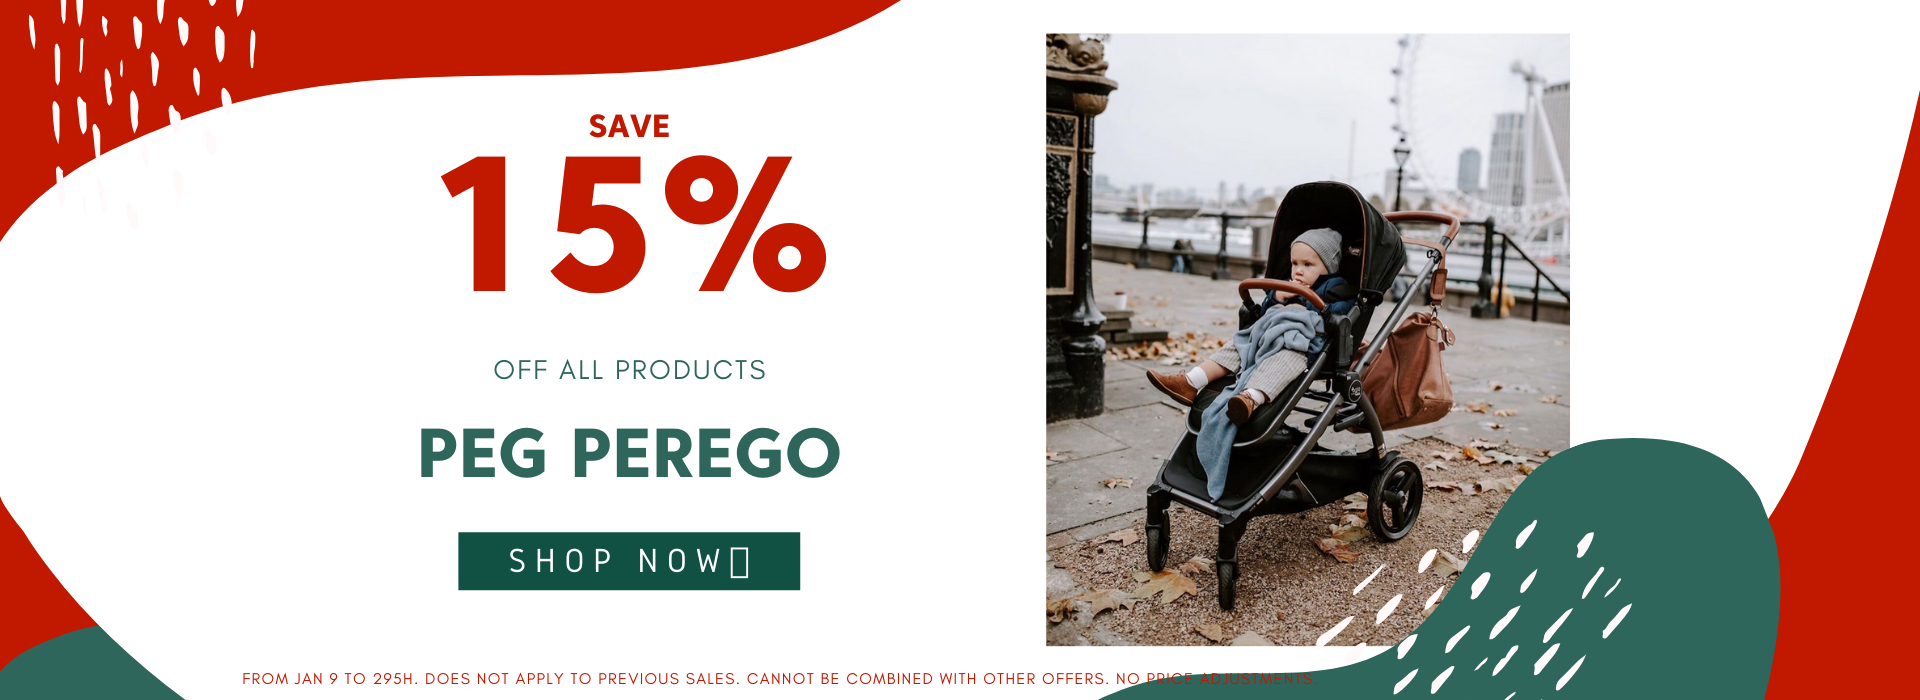 PEG PEREGO 15% OFF